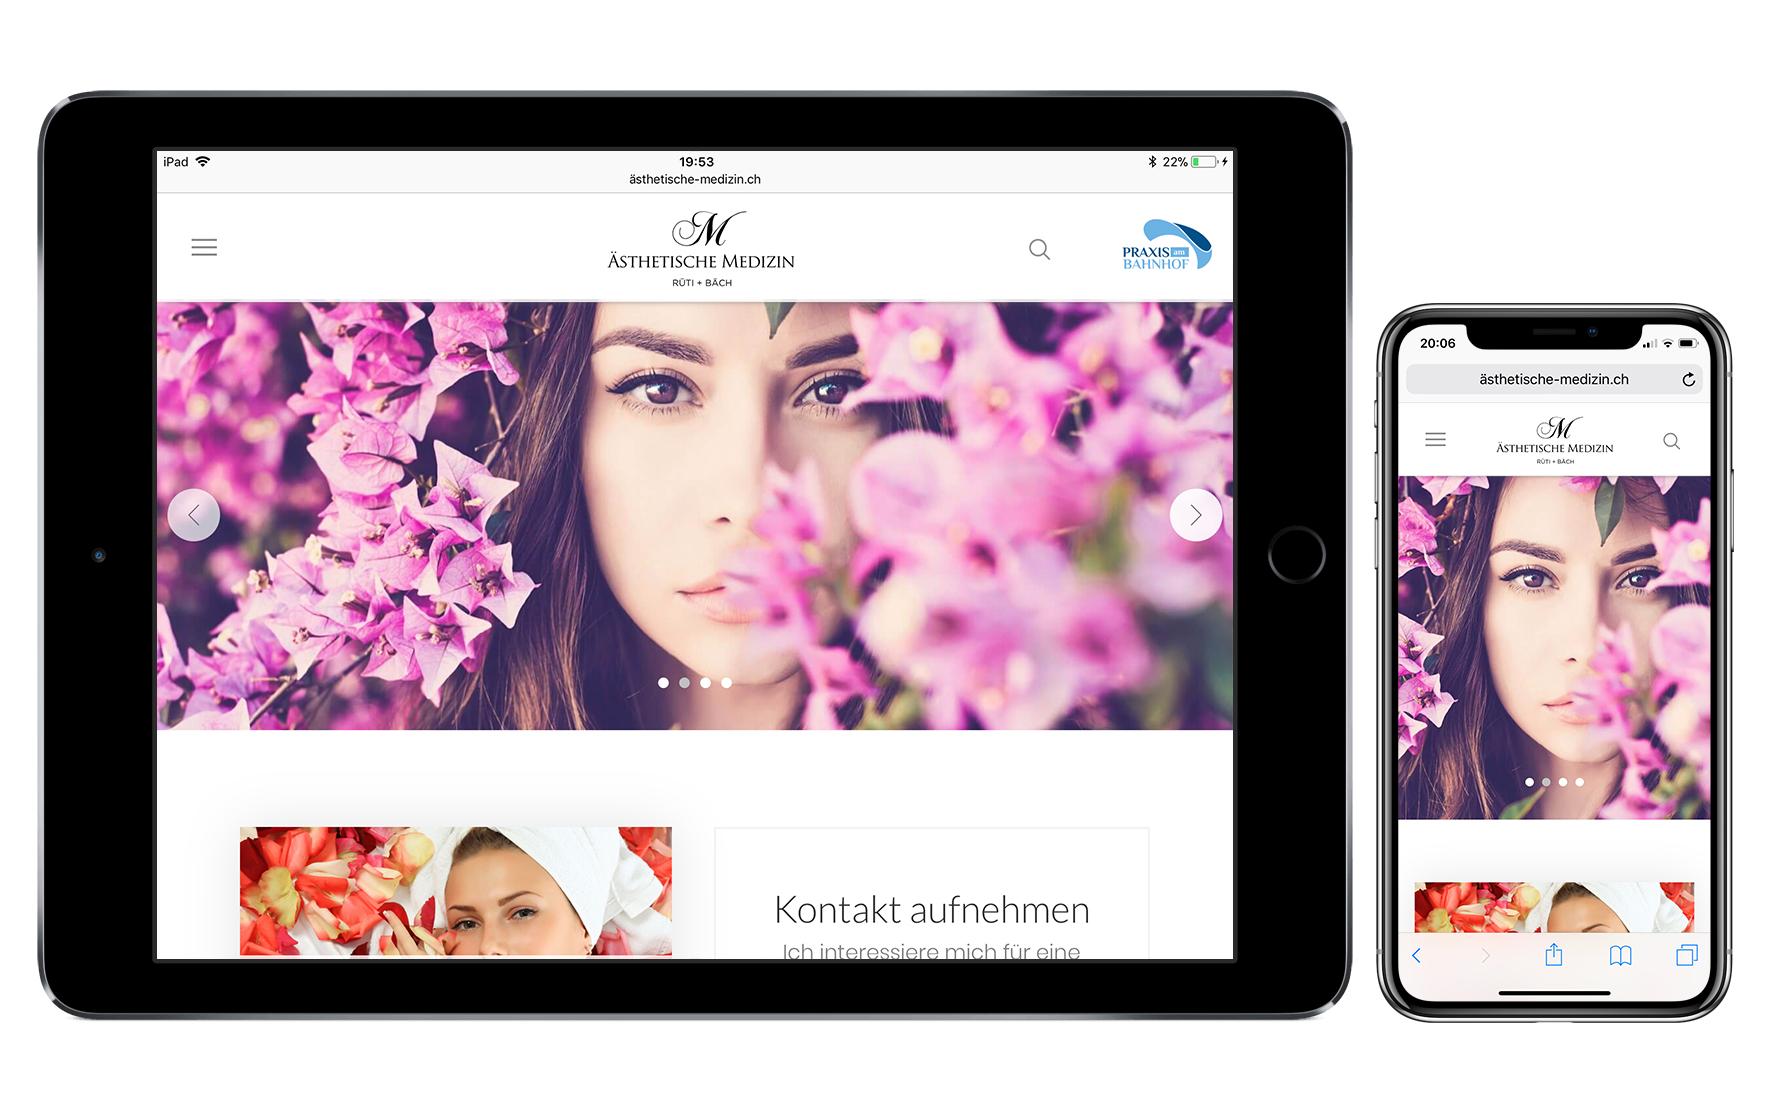 Responsive Webdesign - Ästhetische Medizin Rüti + Bäch